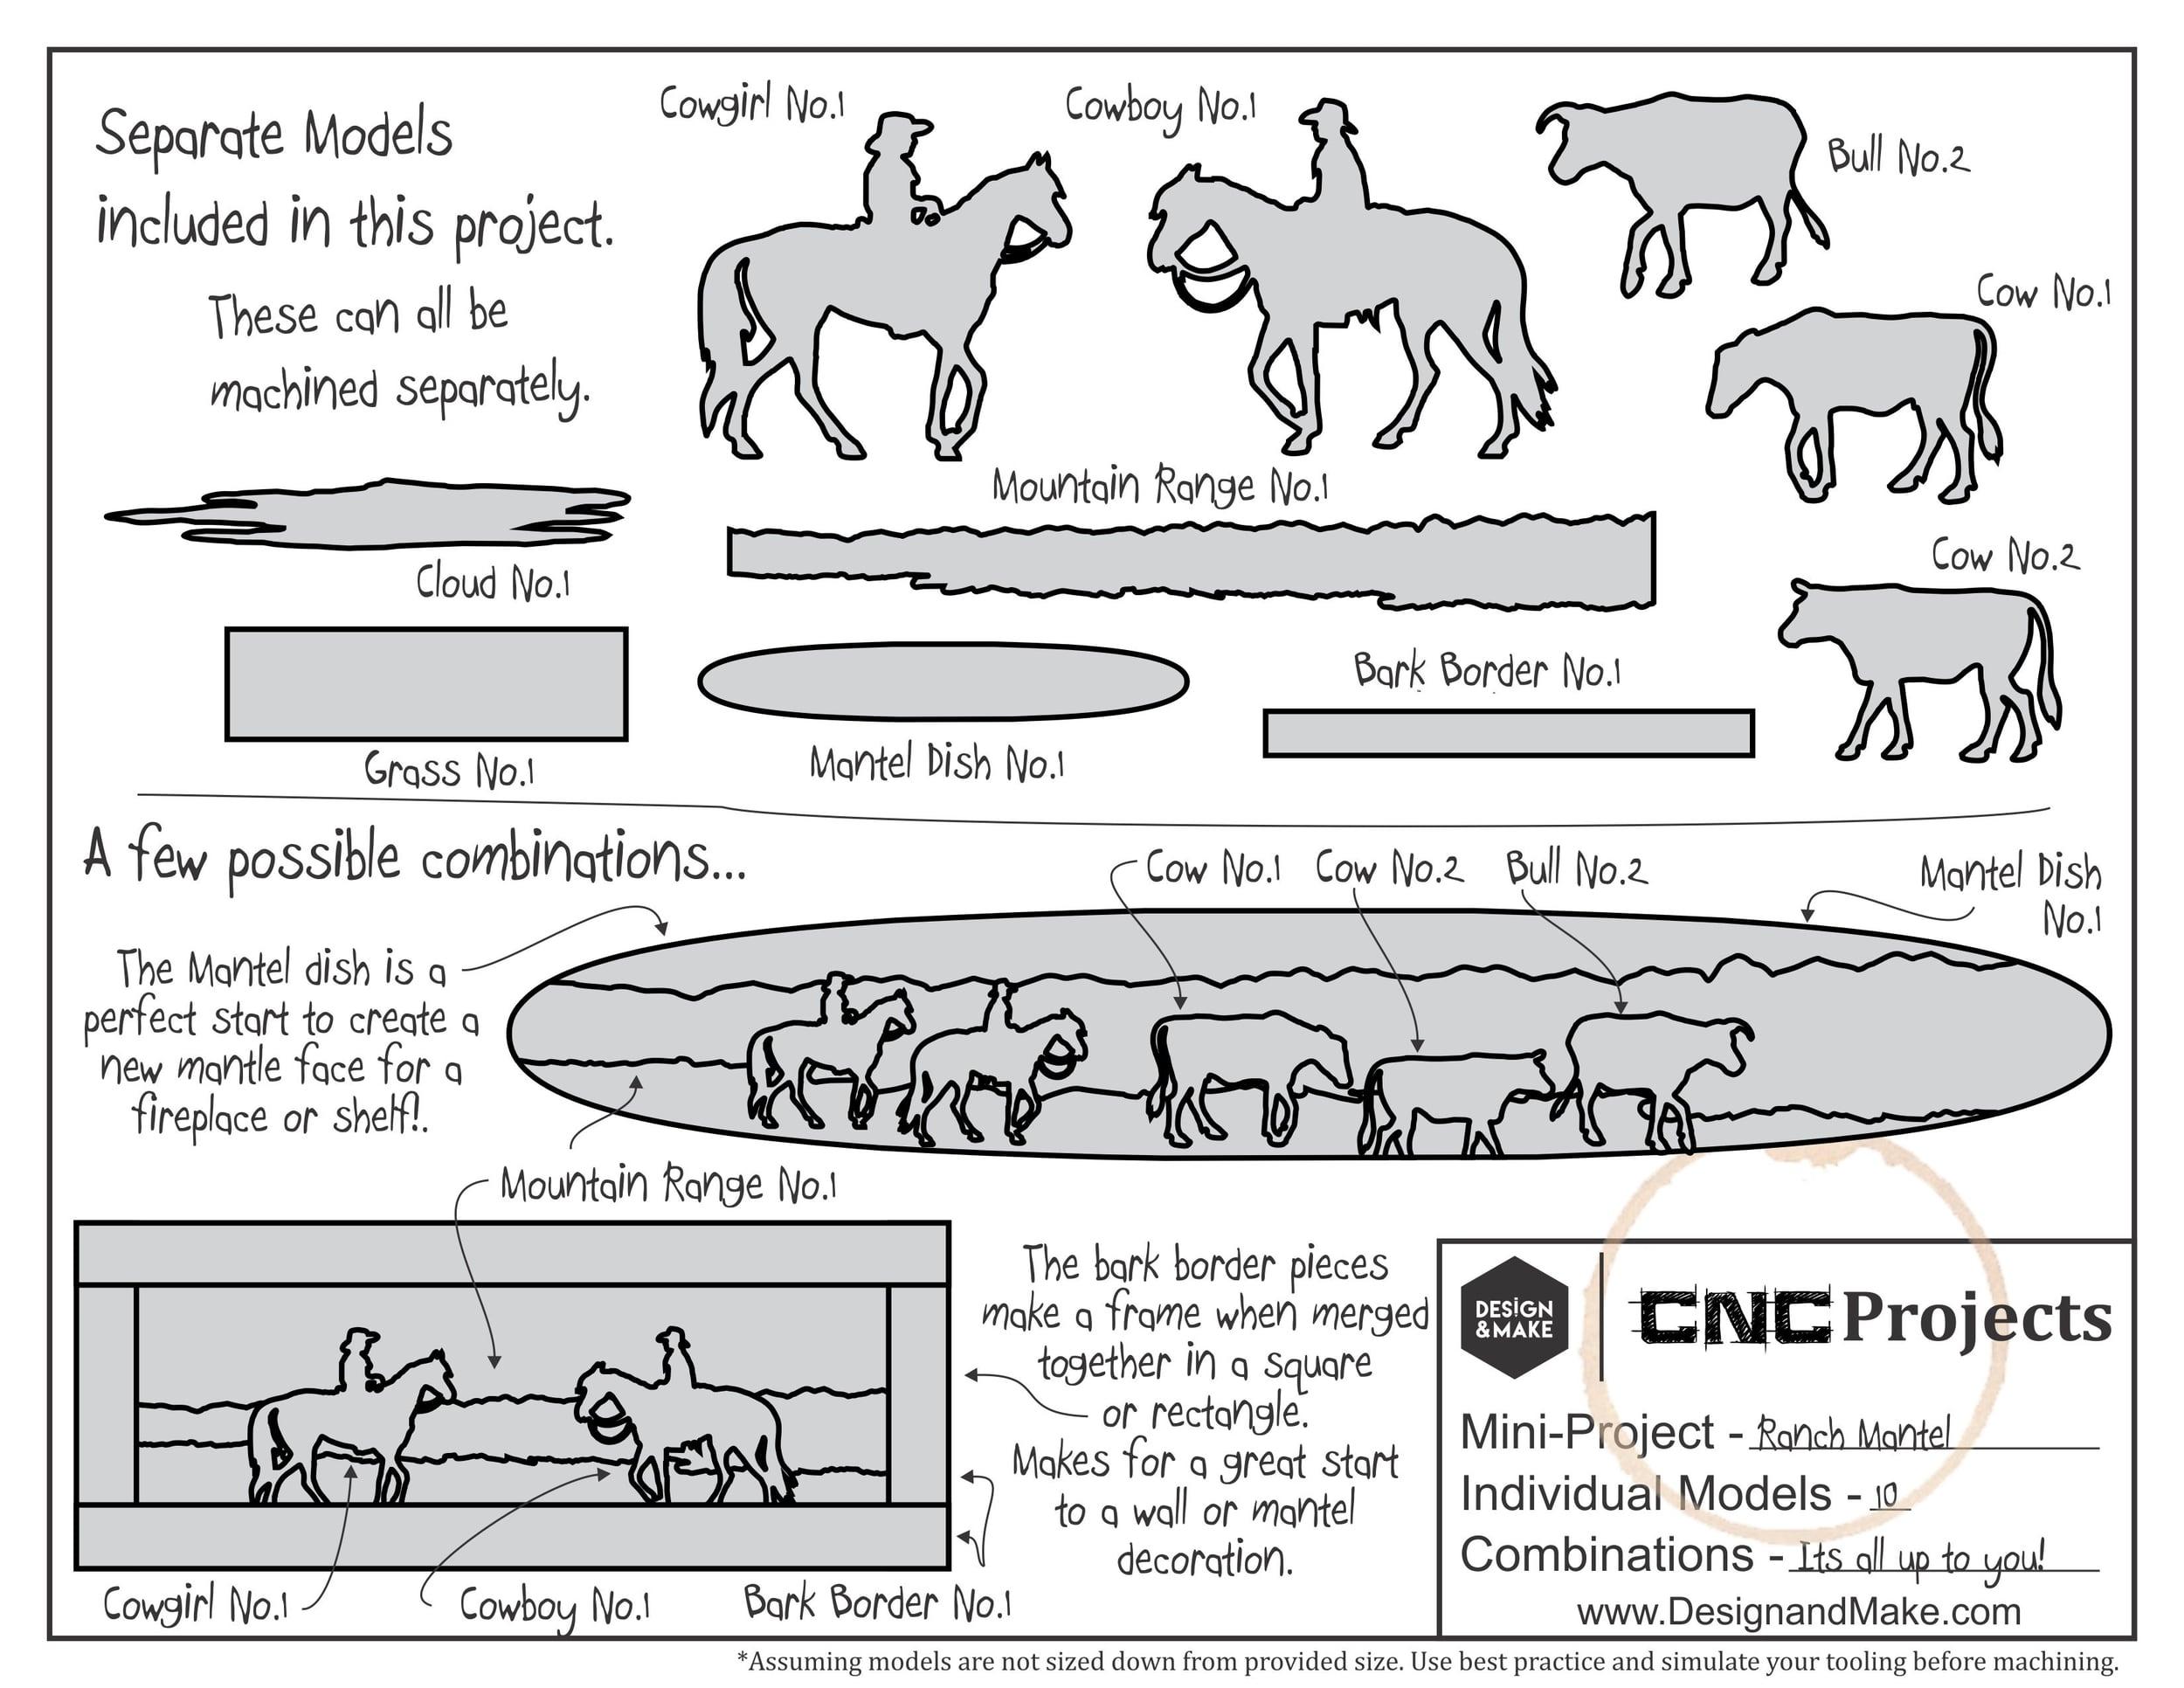 Project Sheet - Ranch Mantel.jpg